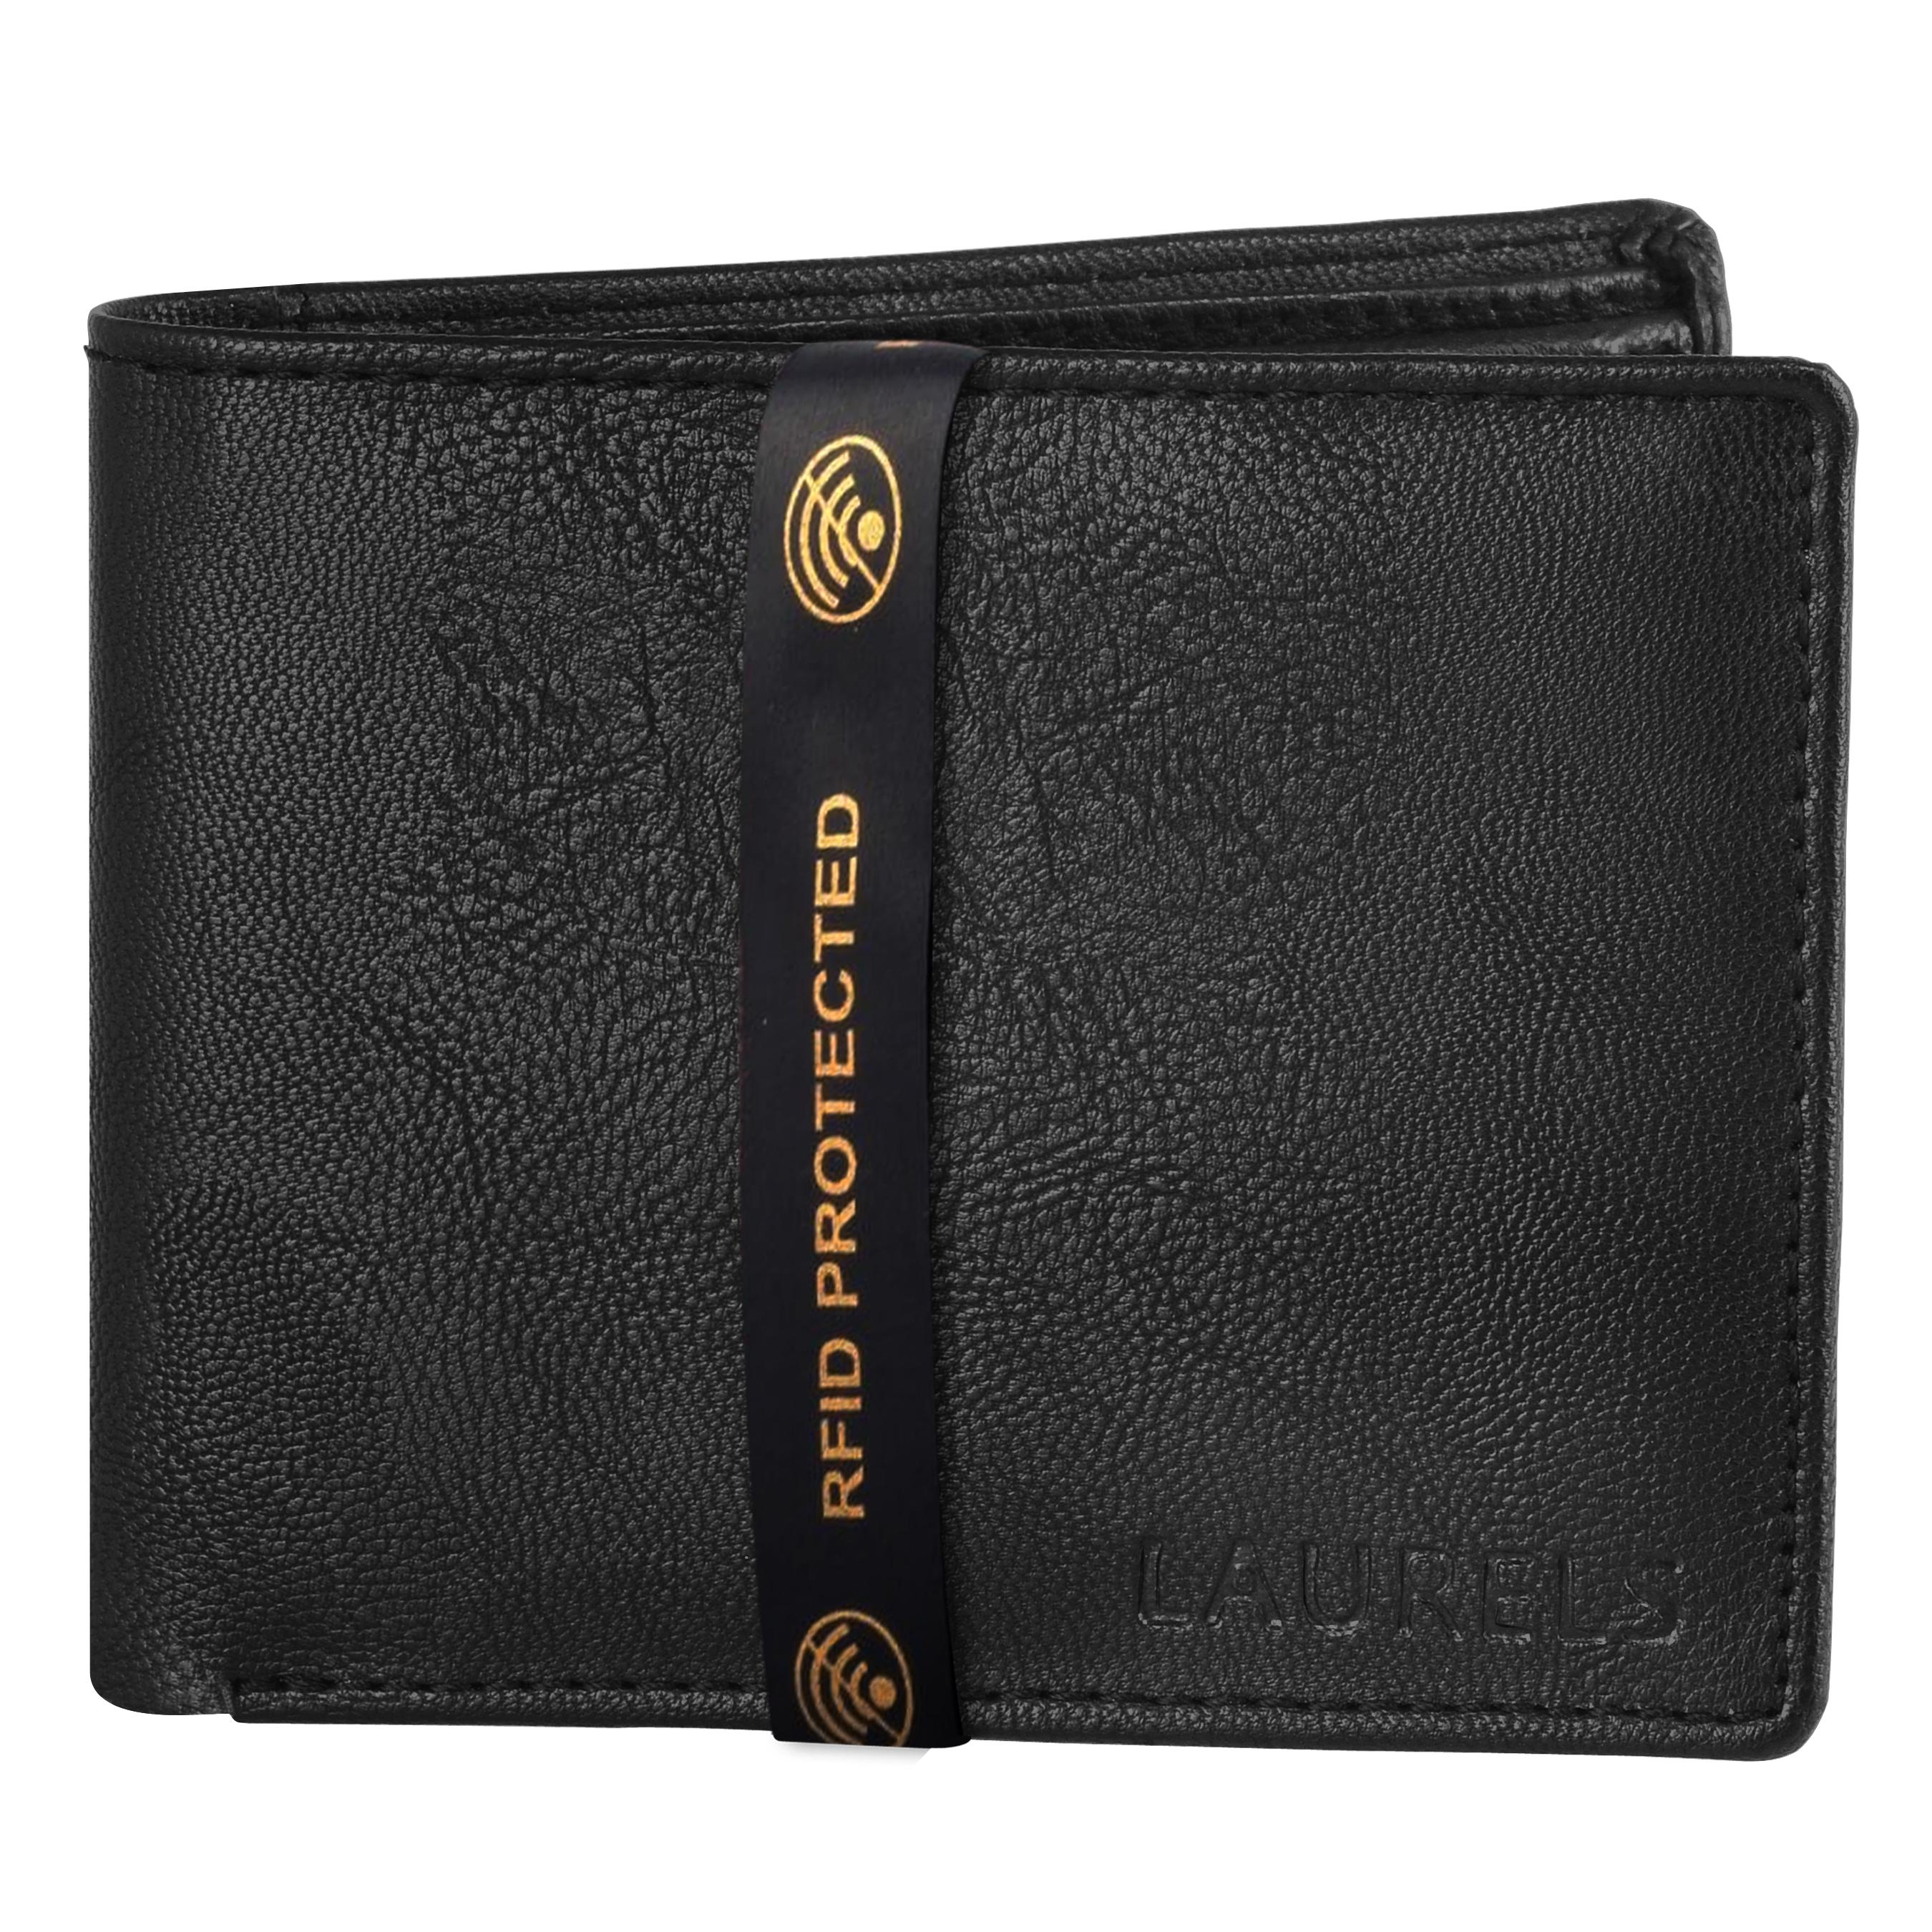 Laurels | Laurels Brye Black Vegan Leather Men Wallet With RFID Protection.